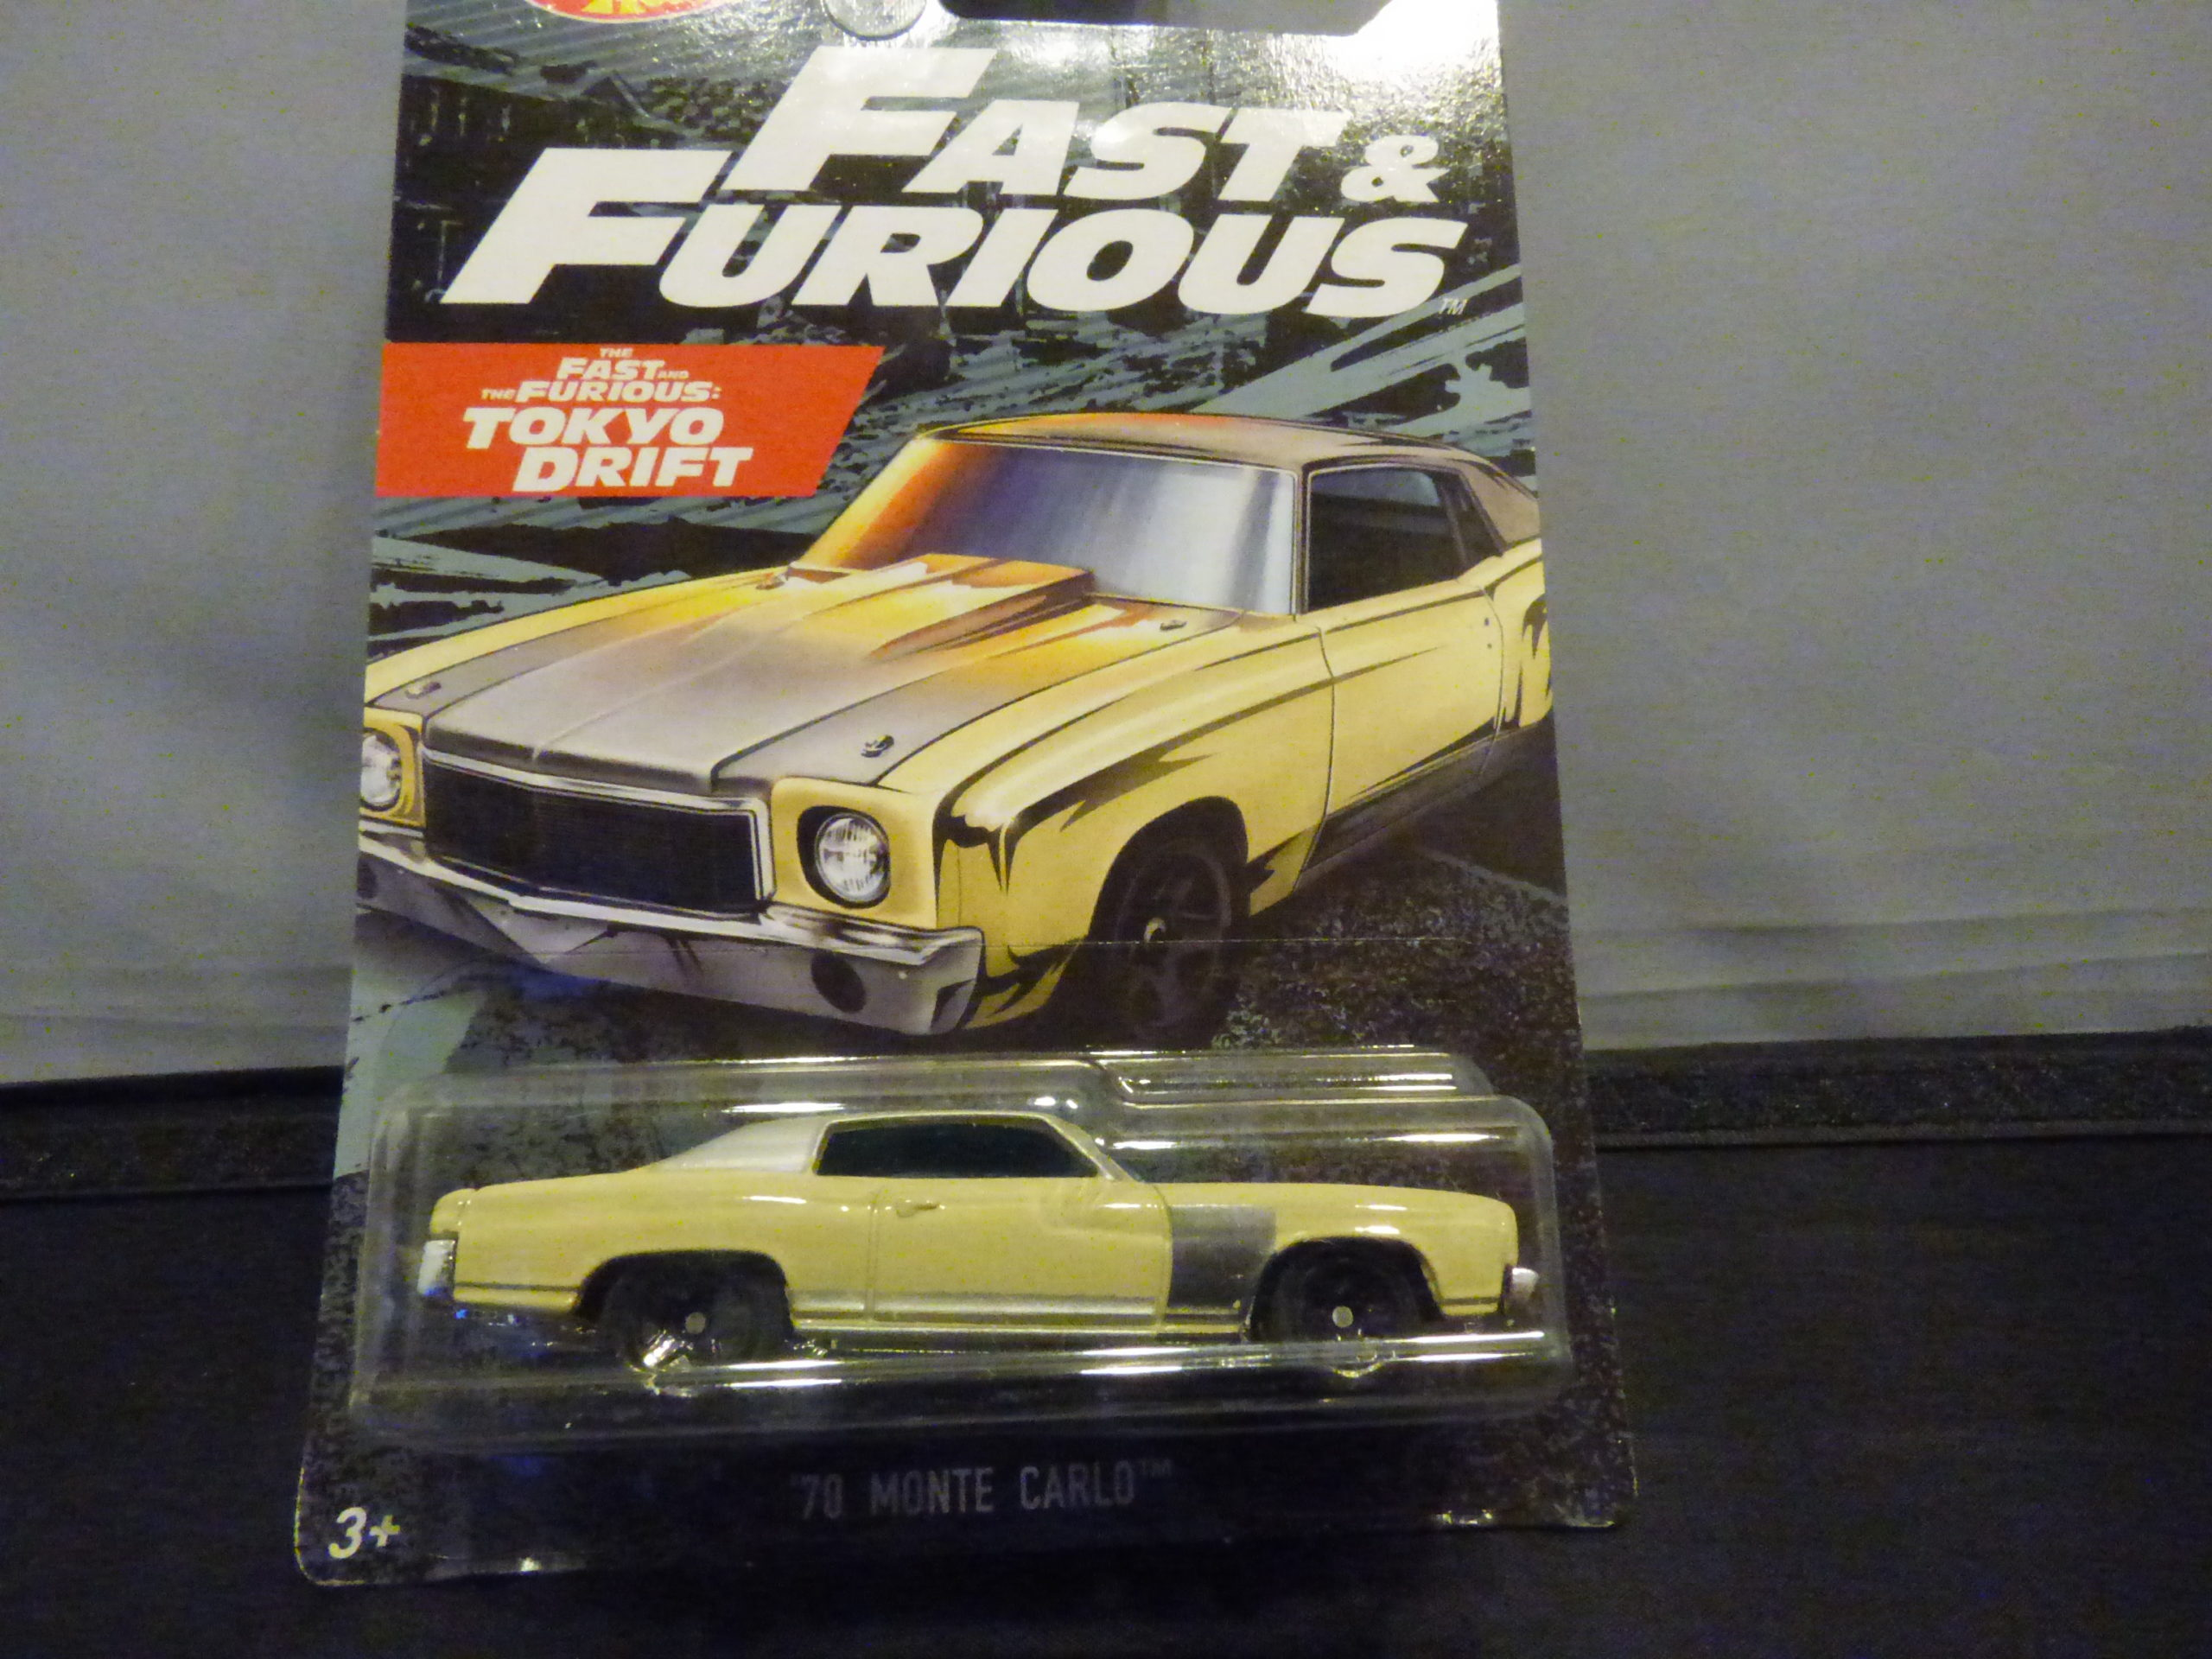 1970 monte carlo/fast & furious